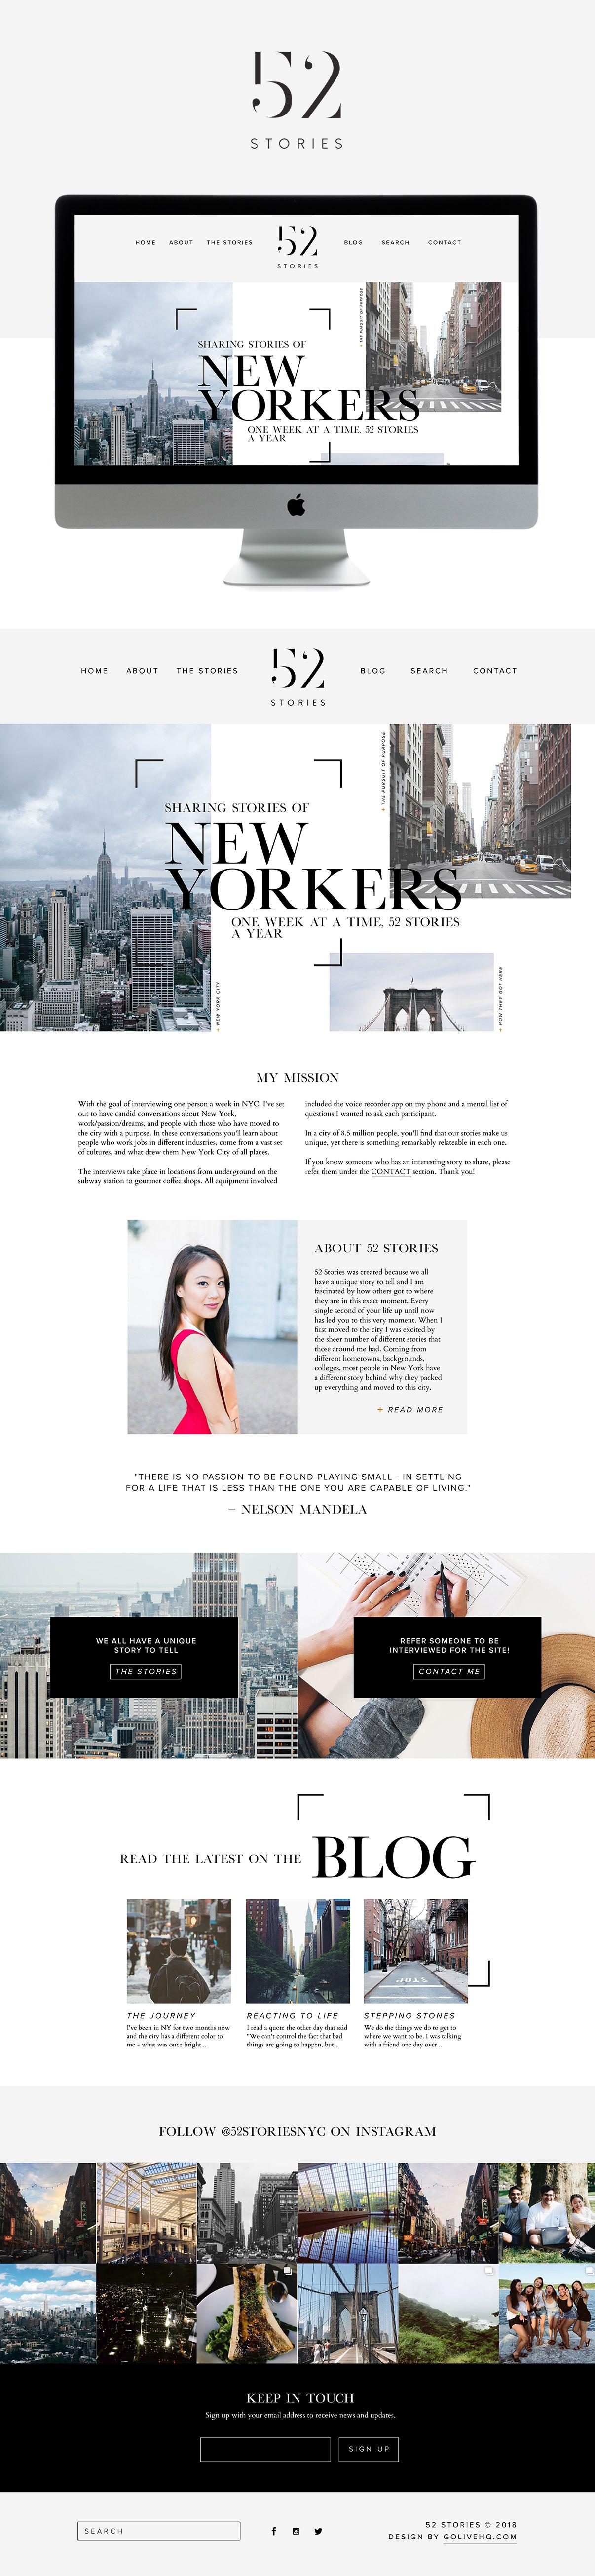 Clean modern website design by Go Live Hq